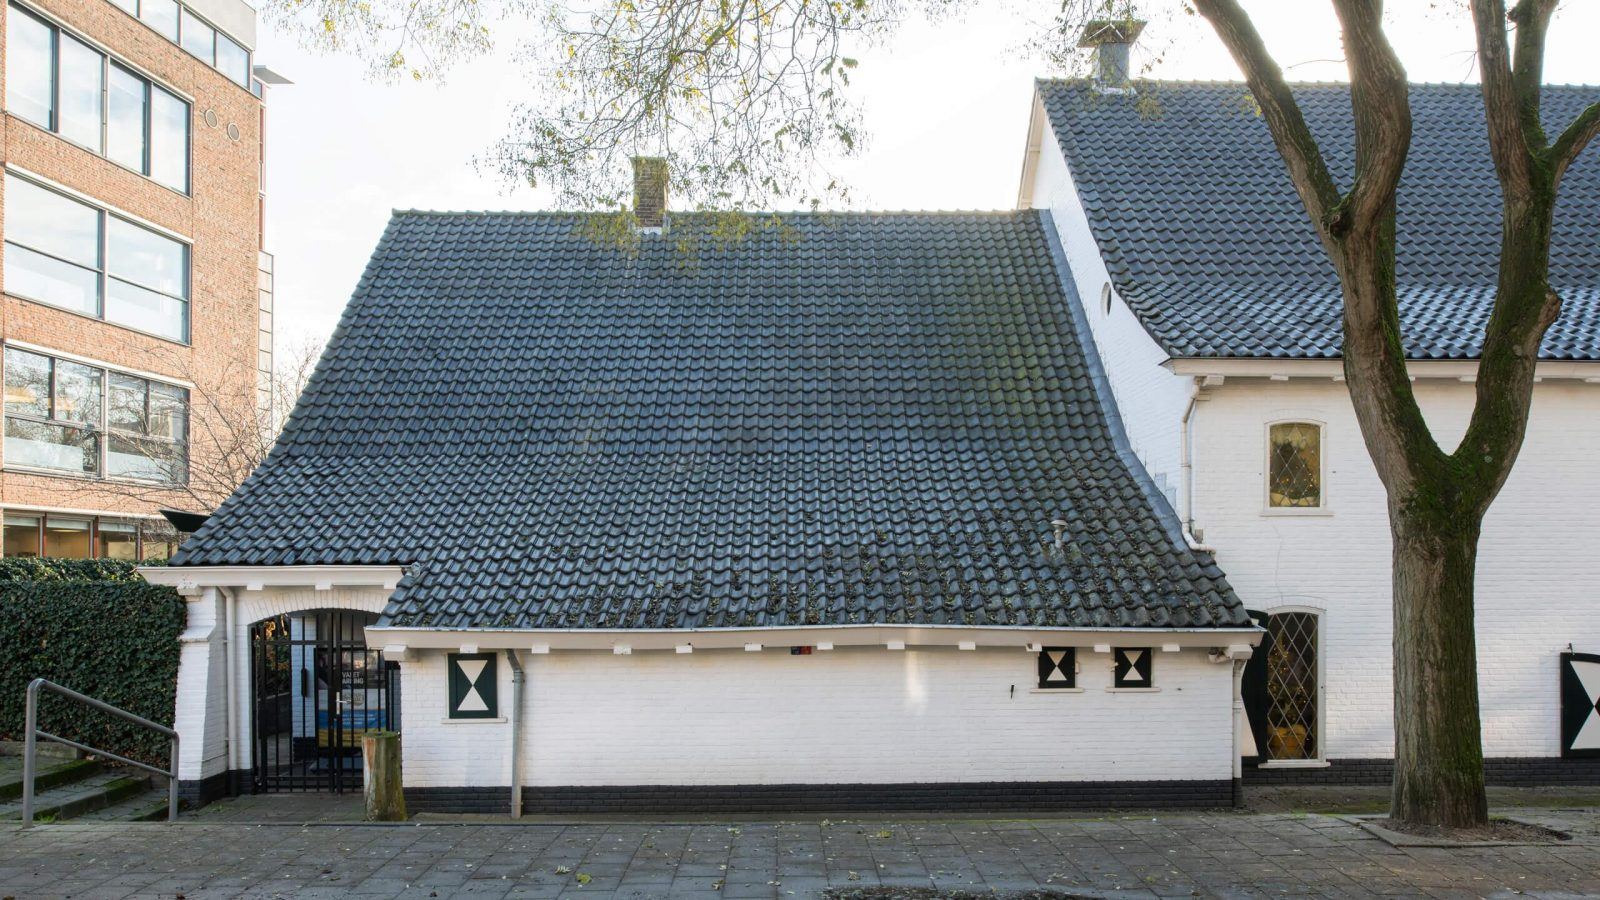 2021 Marlies Lageweg DSC 5262 Old Dutch